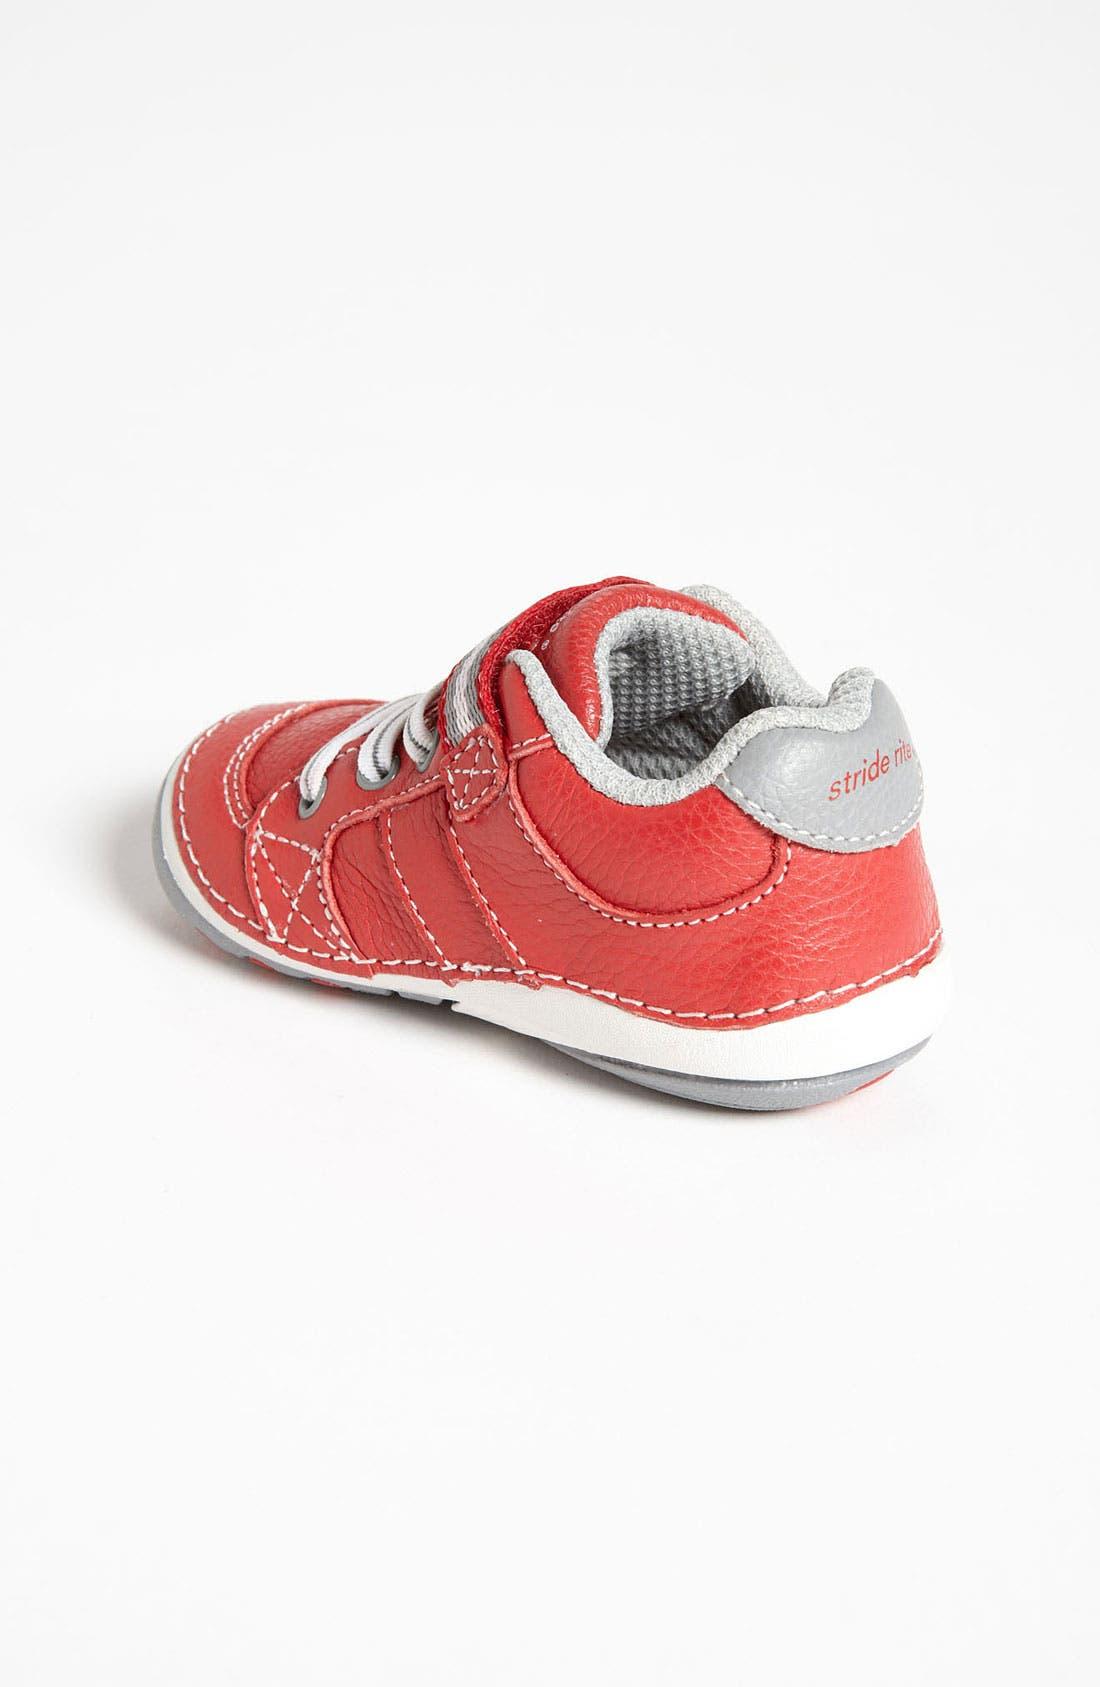 Alternate Image 2  - Stride Rite 'Artie' Sneaker (Baby & Walker)